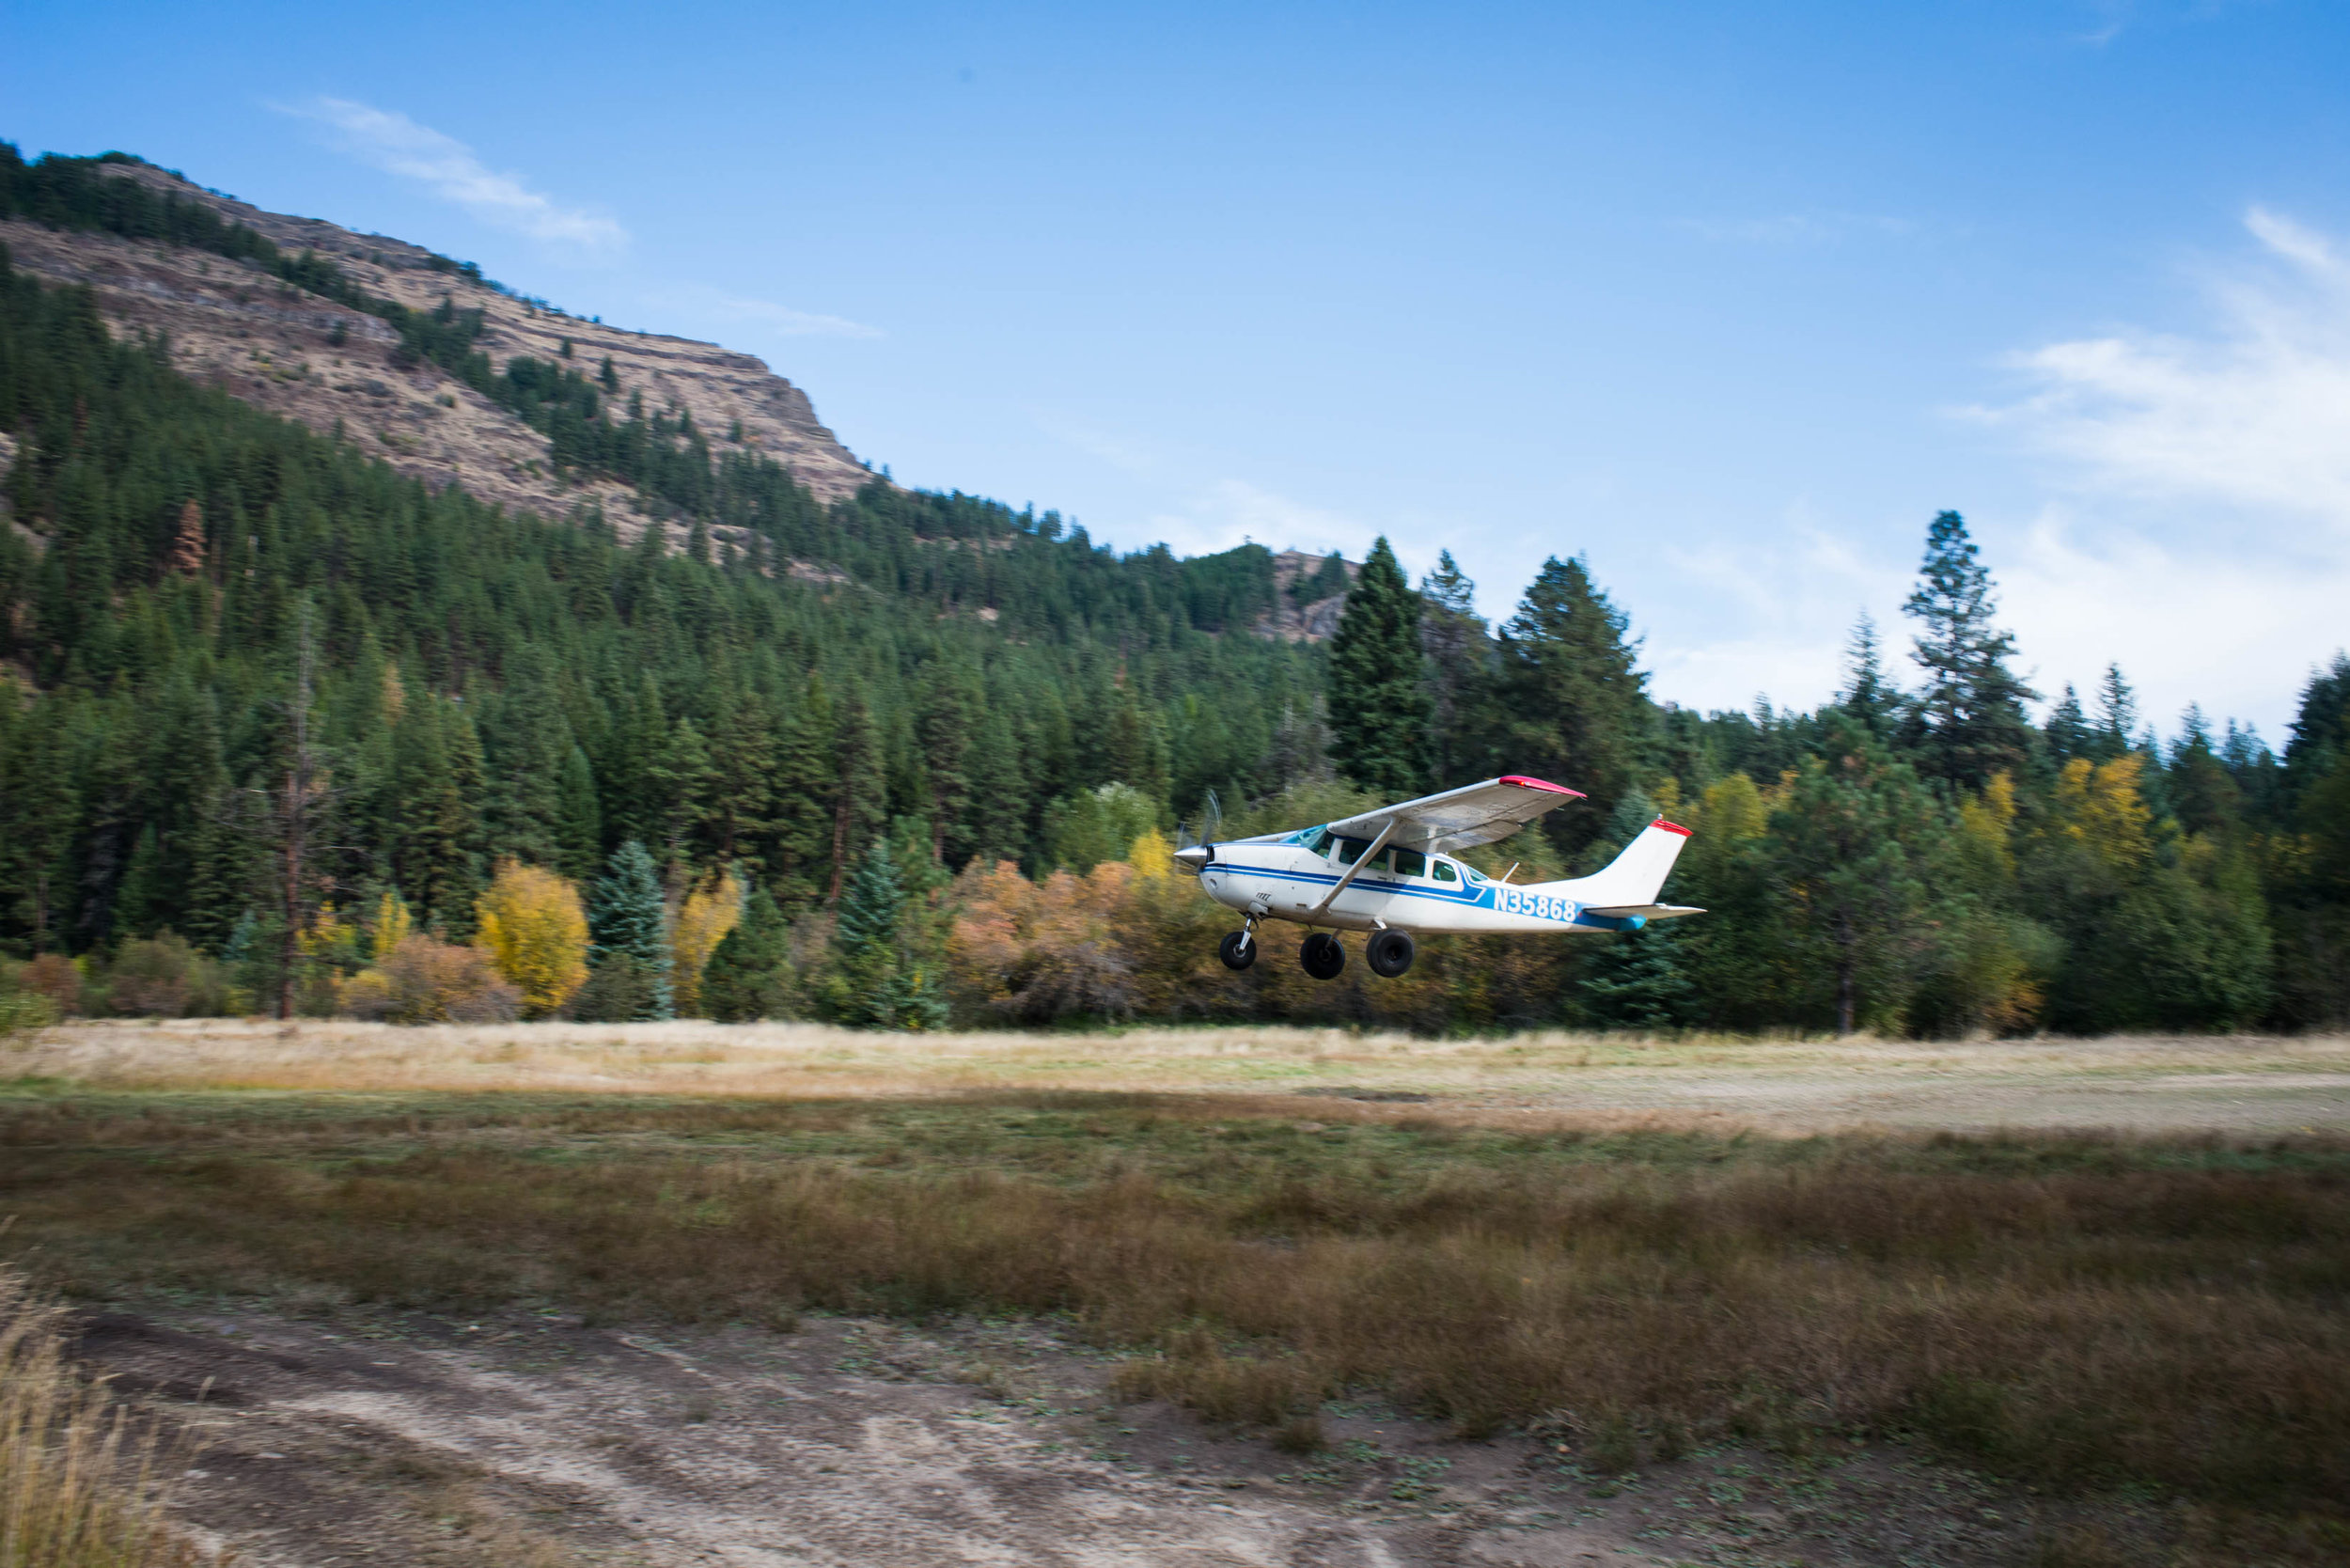 Minam_River_Lodge_Wallowa_Mountains_Eagle_Cap_Wilderness_Oregon_Autumn_2017_Please_Credit_Talia_Jean_Galvin-12.jpg